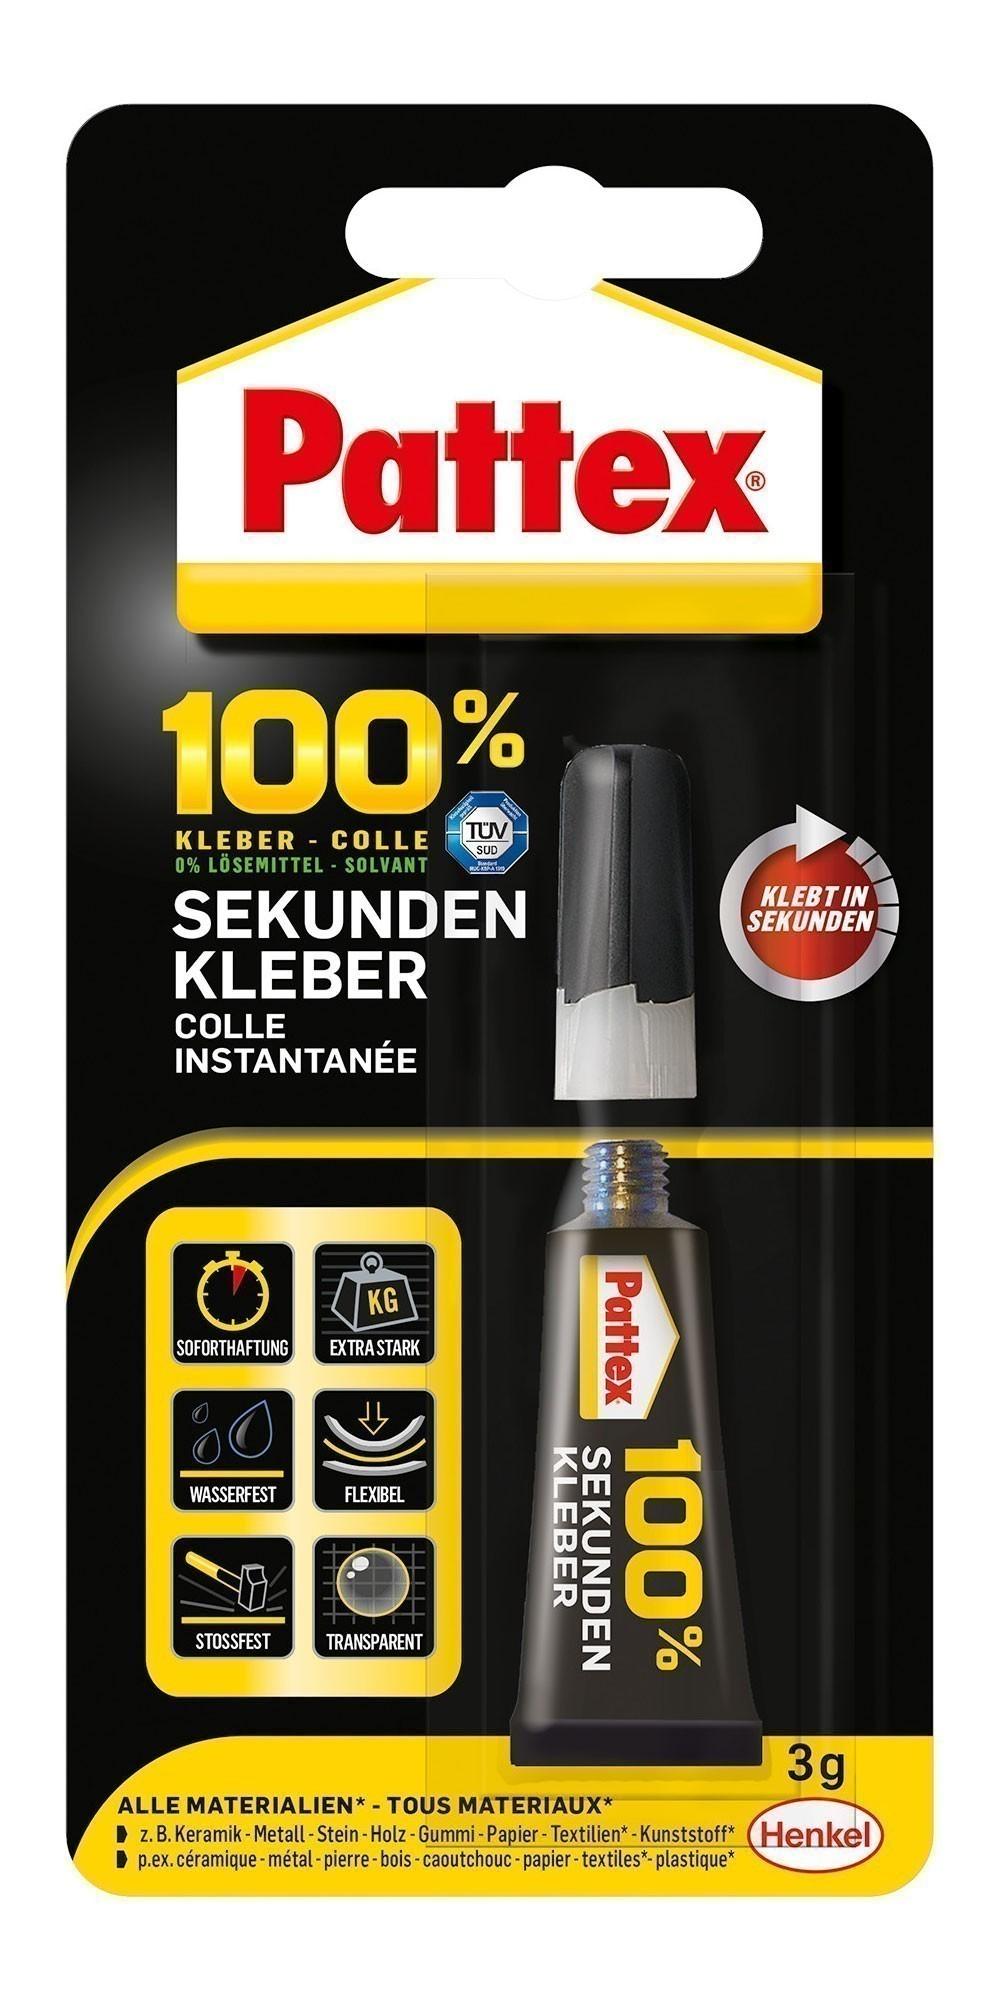 Pattex 100% Sekundenkleber 3g Bild 1